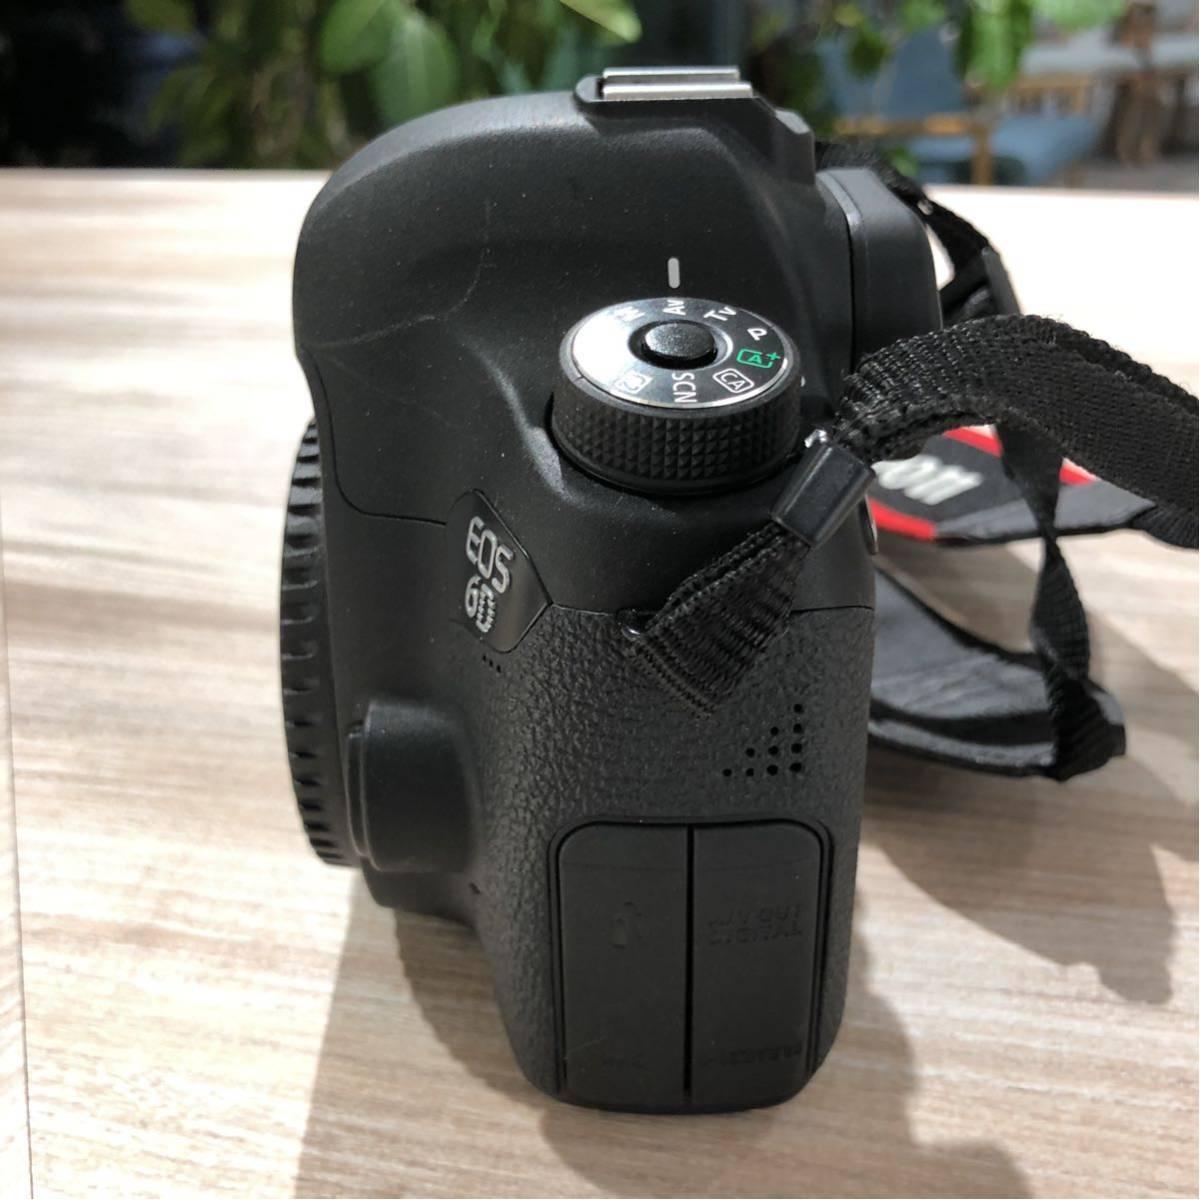 Canon キャノン 一眼レフ フルサイズ 6D ボディ 付属品完備_画像7